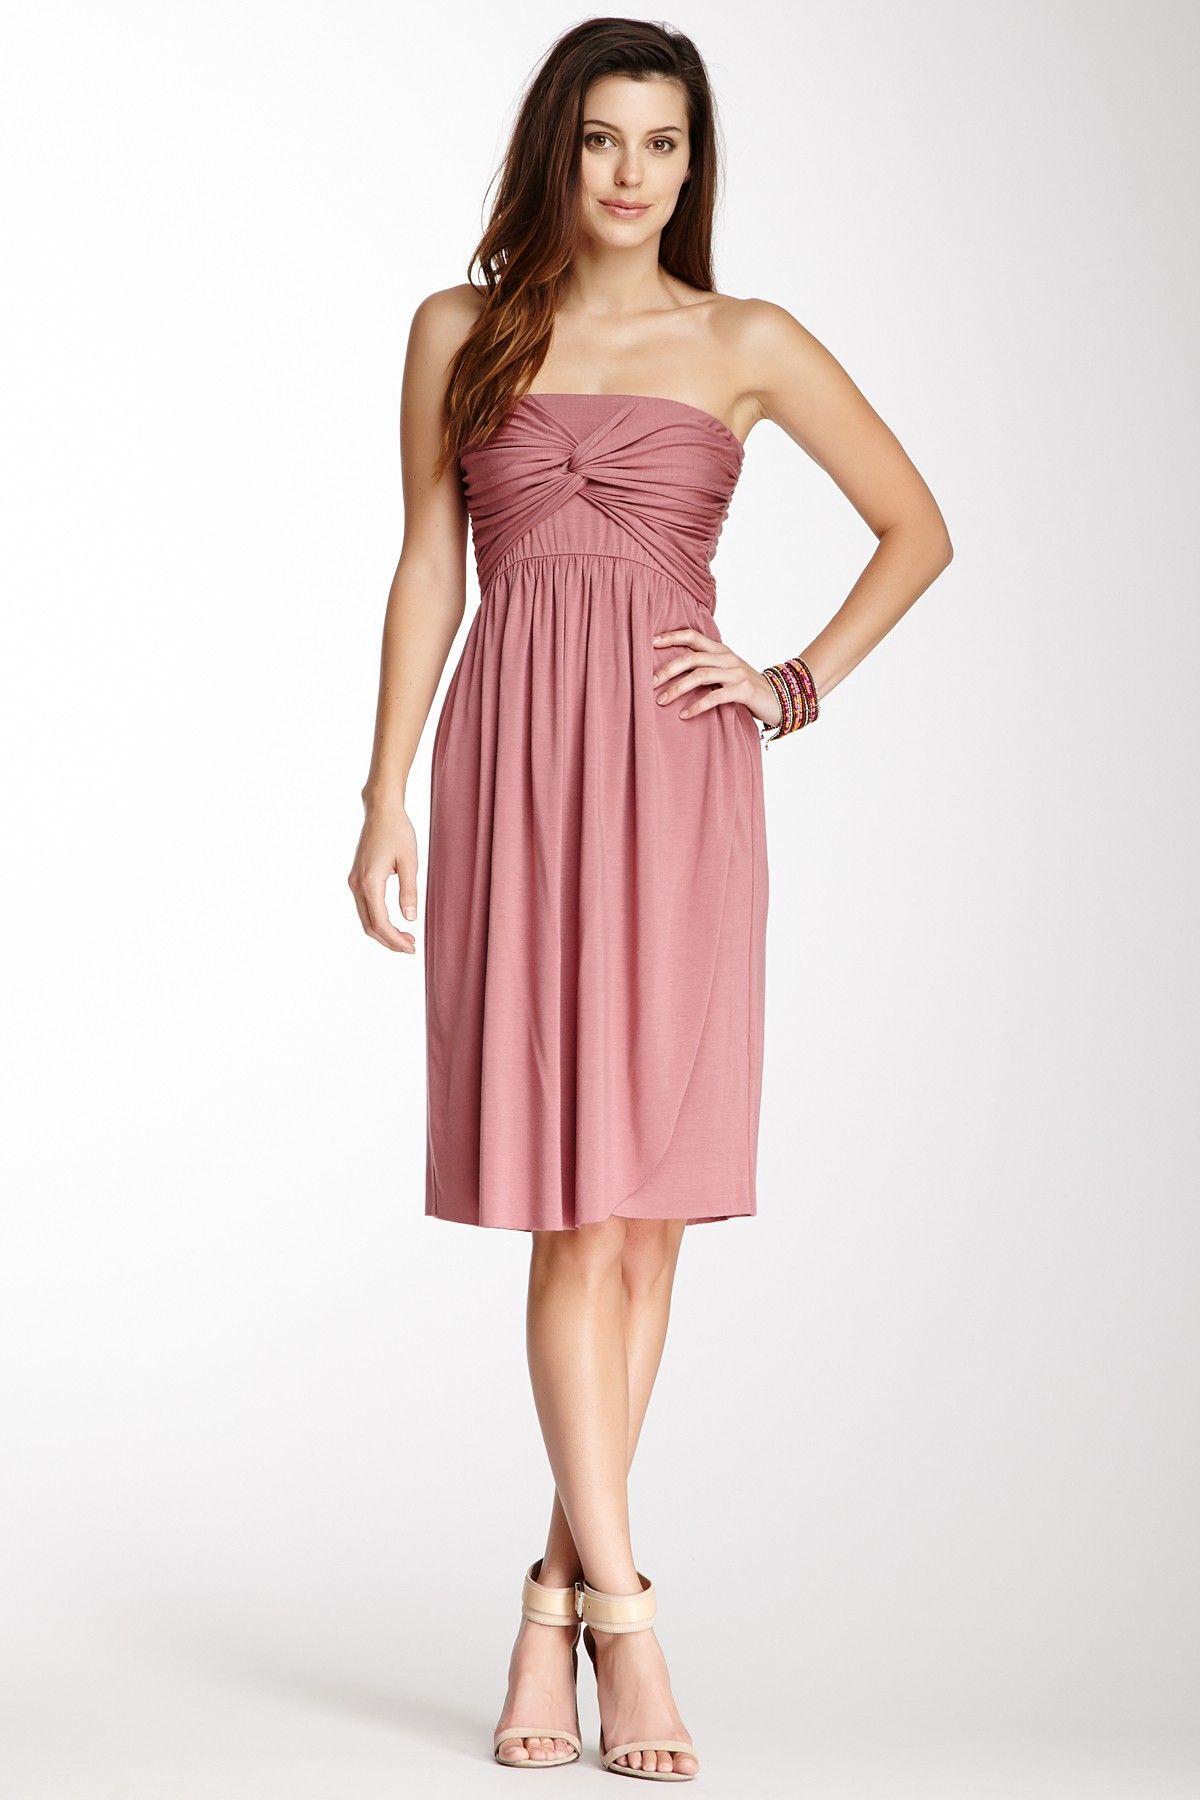 Lionel Strapless Dress on HauteLook | Fashion | Pinterest | Femenino ...